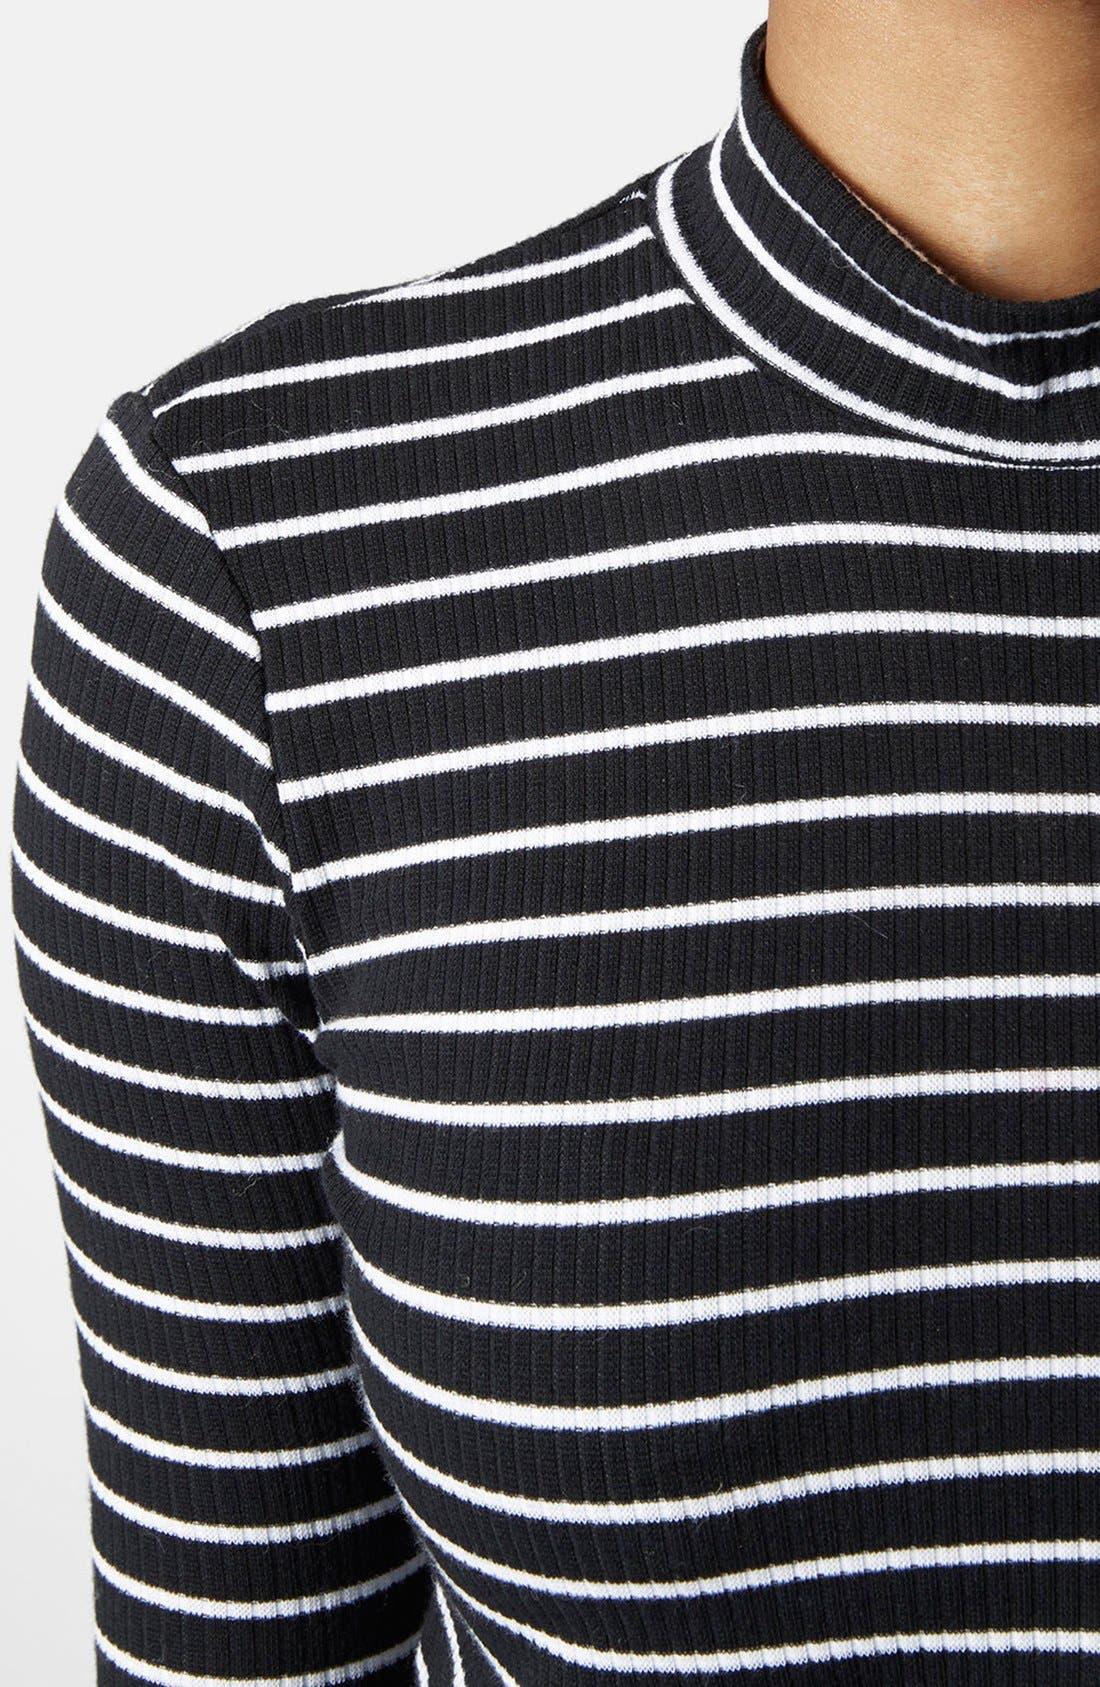 Alternate Image 3  - Topshop Long Sleeve Rib Knit Top